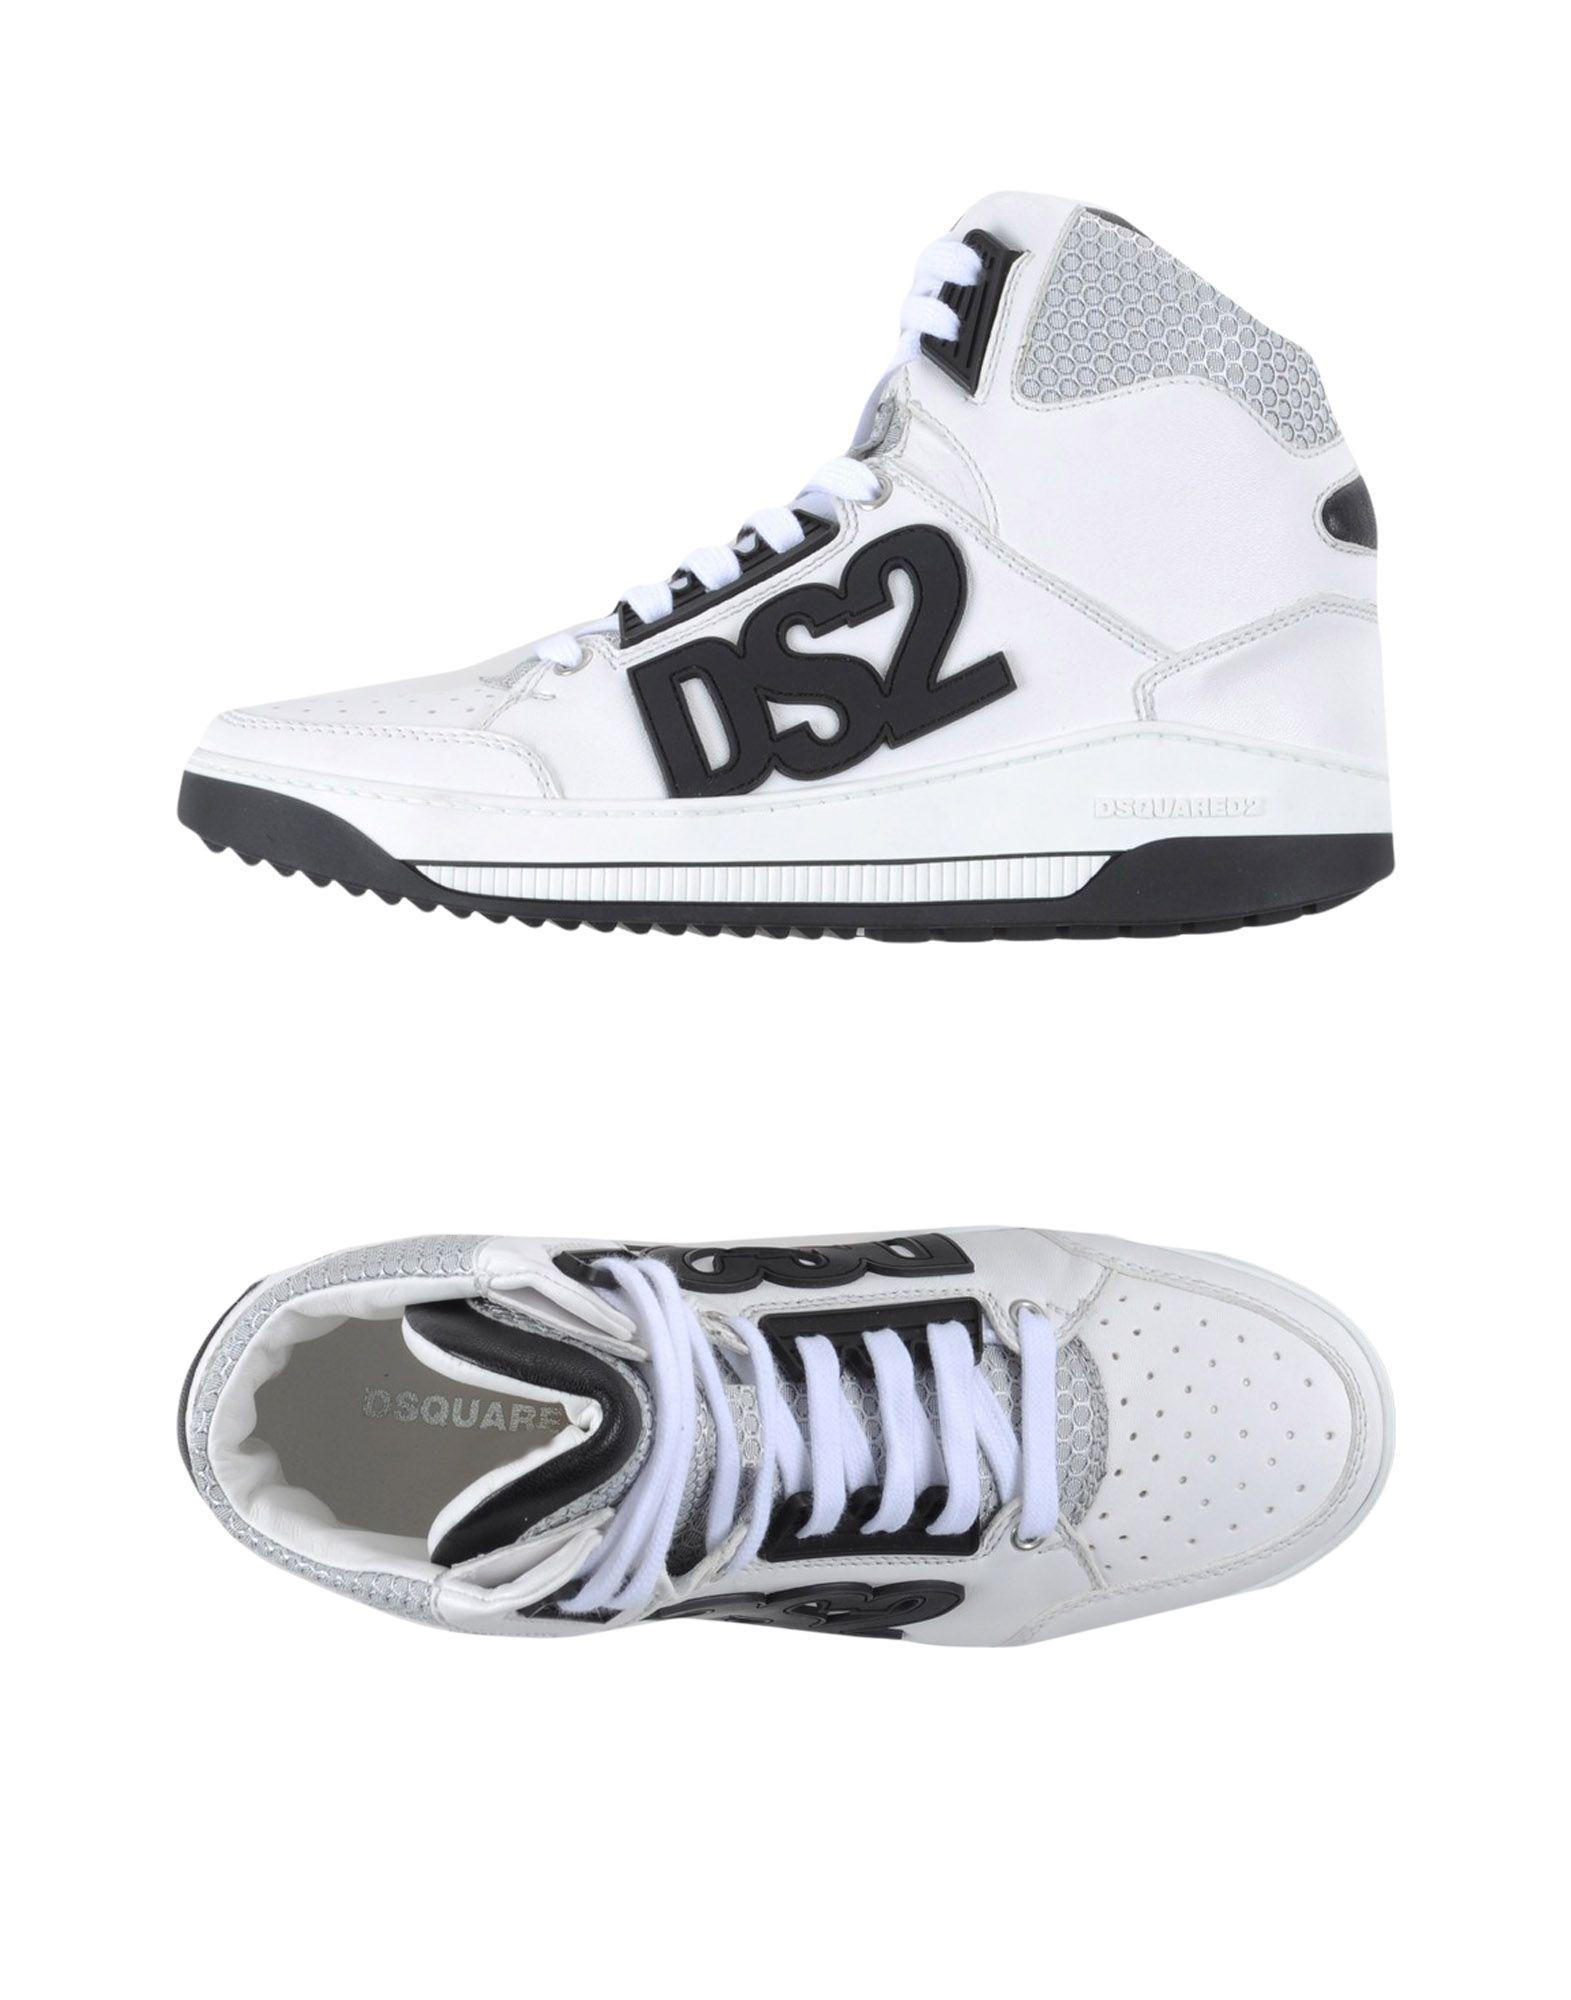 Dsquared2 Sneakers Herren  11014802HB Gute Qualität beliebte Schuhe